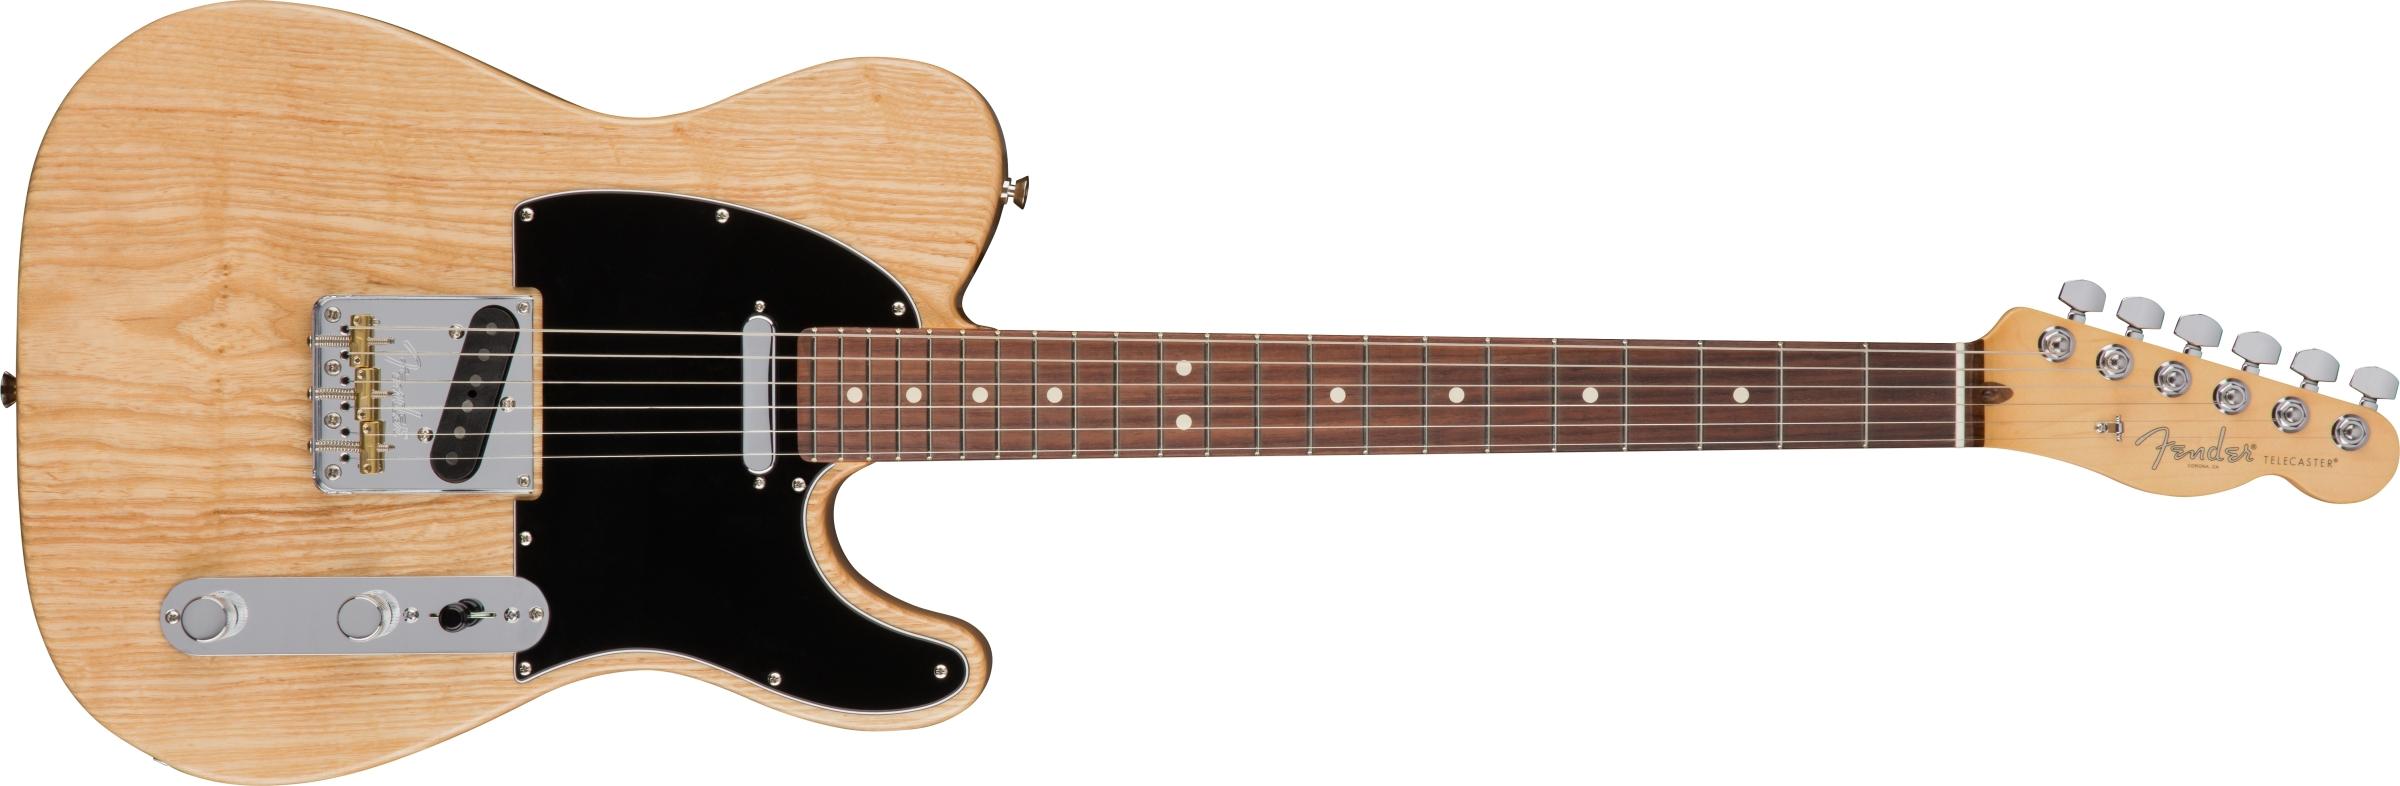 Fender American Pro Telecaster 174 Rosewood Fingerboard Natural